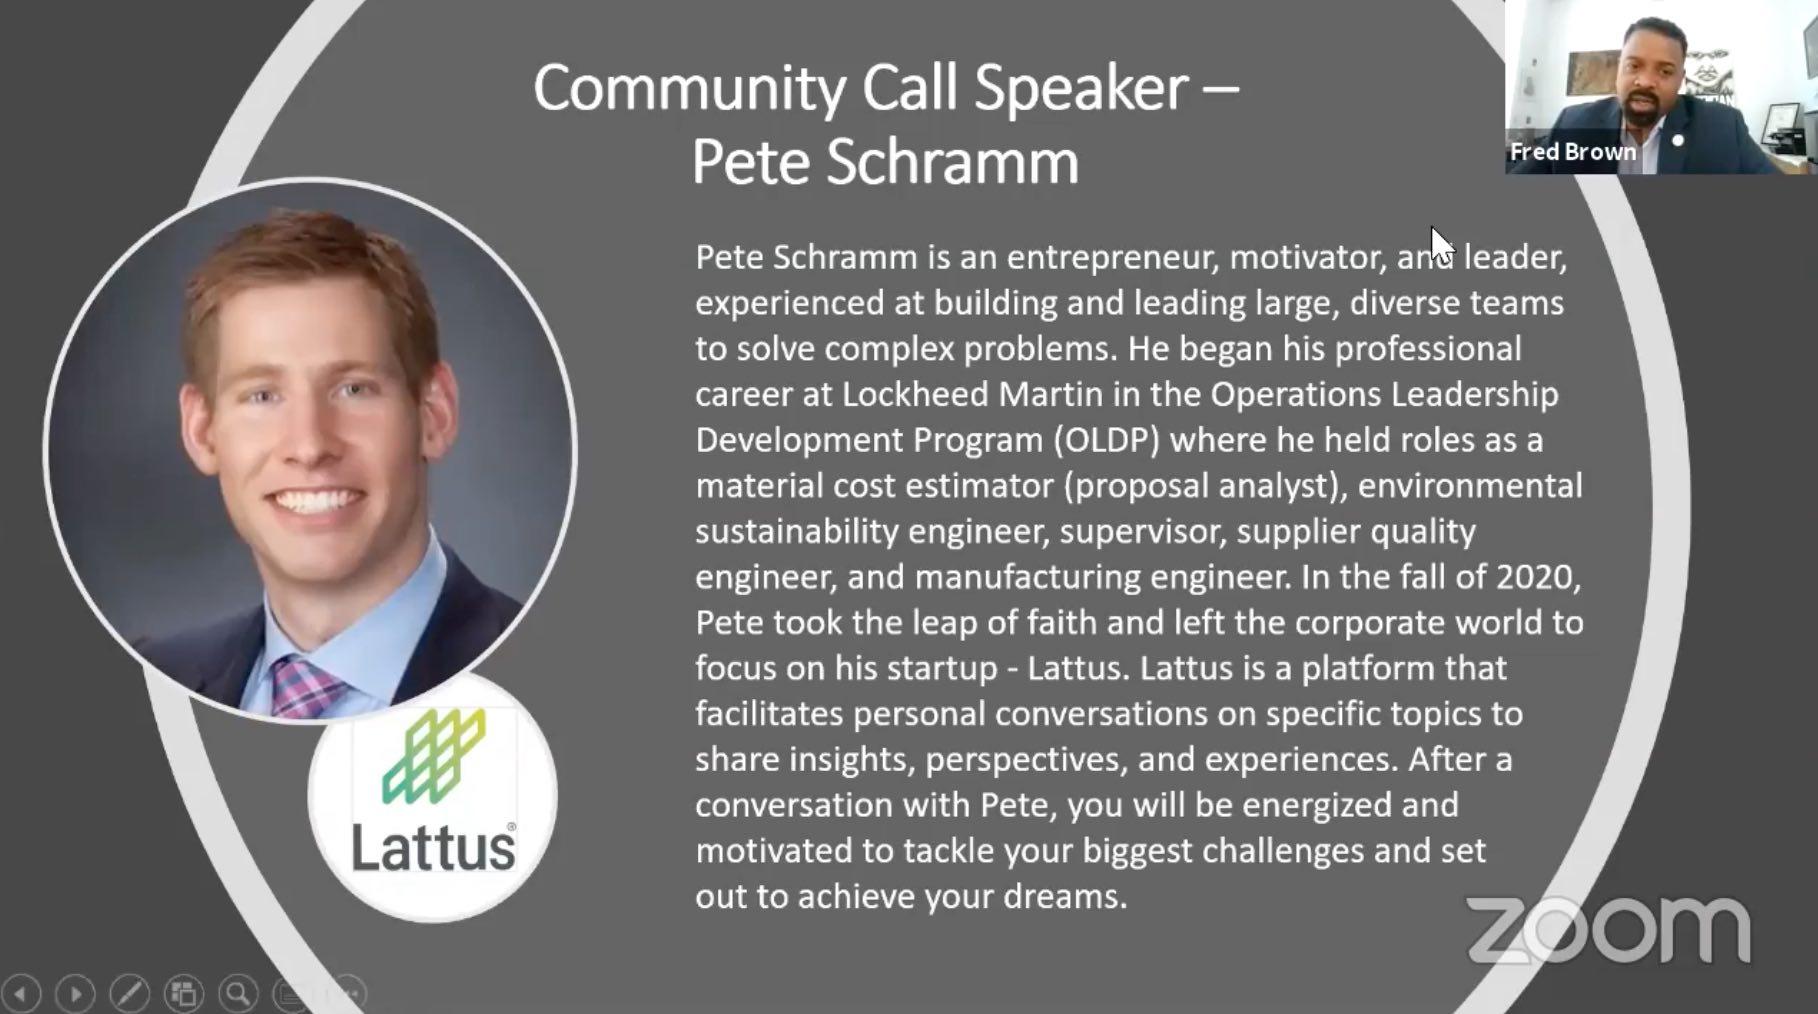 biographical slide of Pete Schramm